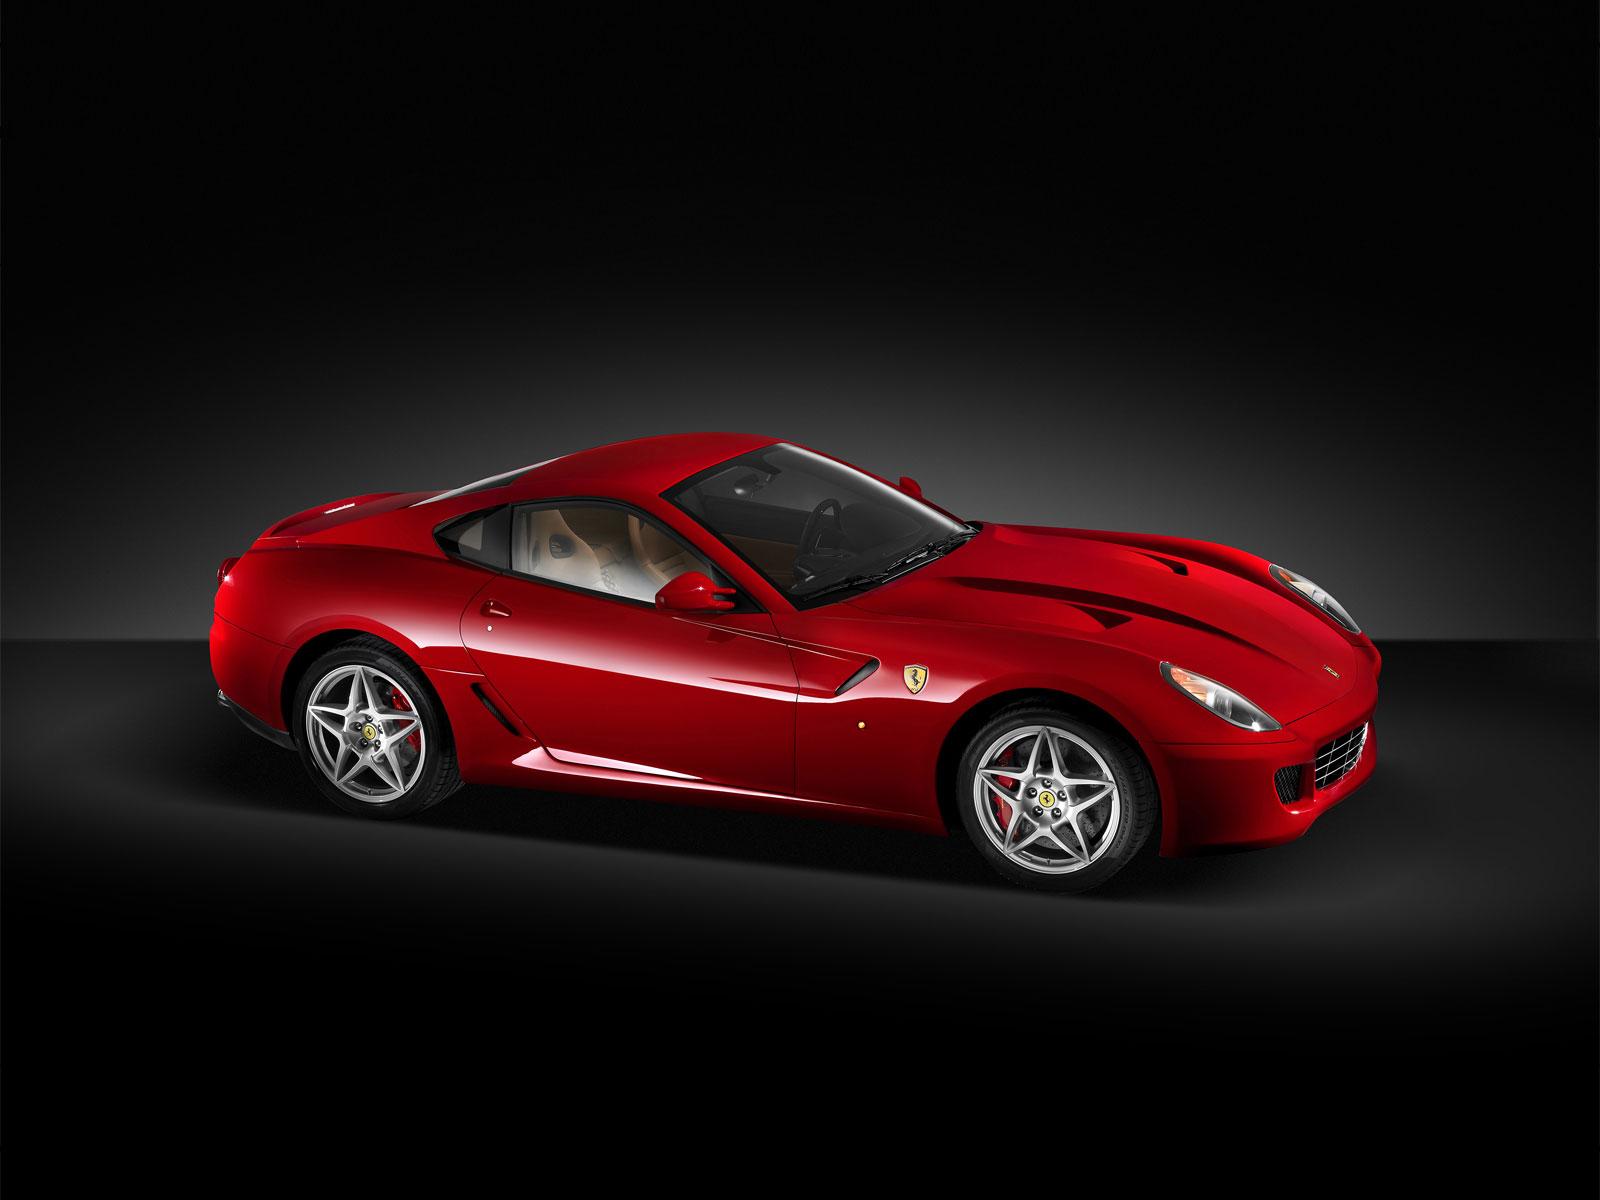 http://images.caradisiac.com/images/0/9/6/7/10967/S0-Ferrari-F599-GTB-Fiorano-une-orgie-de-photos-HD-55845.jpg